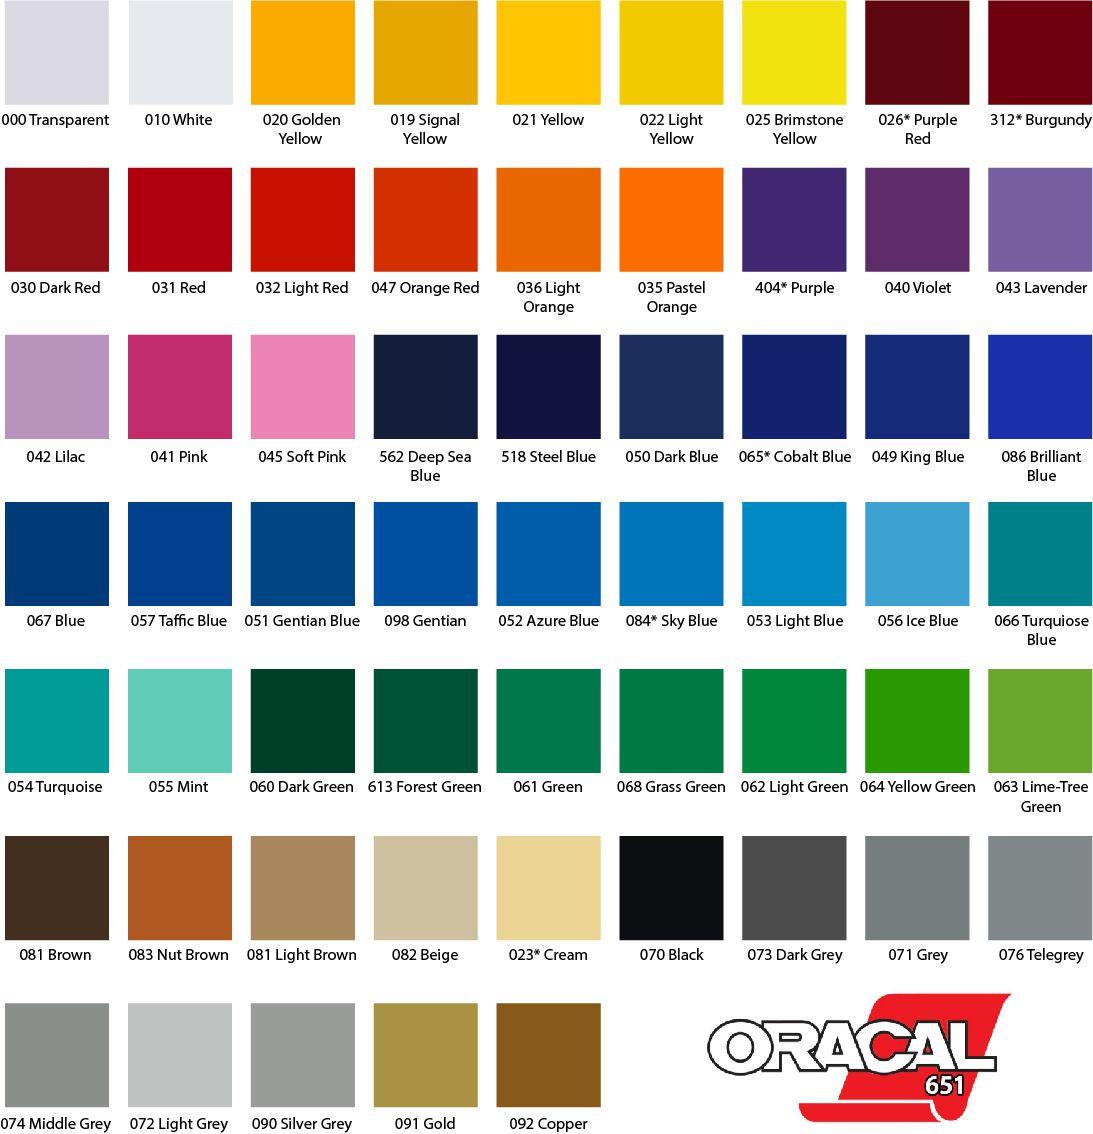 Adesivo Oracal 651 404 Purple 1,26m x 1,00m